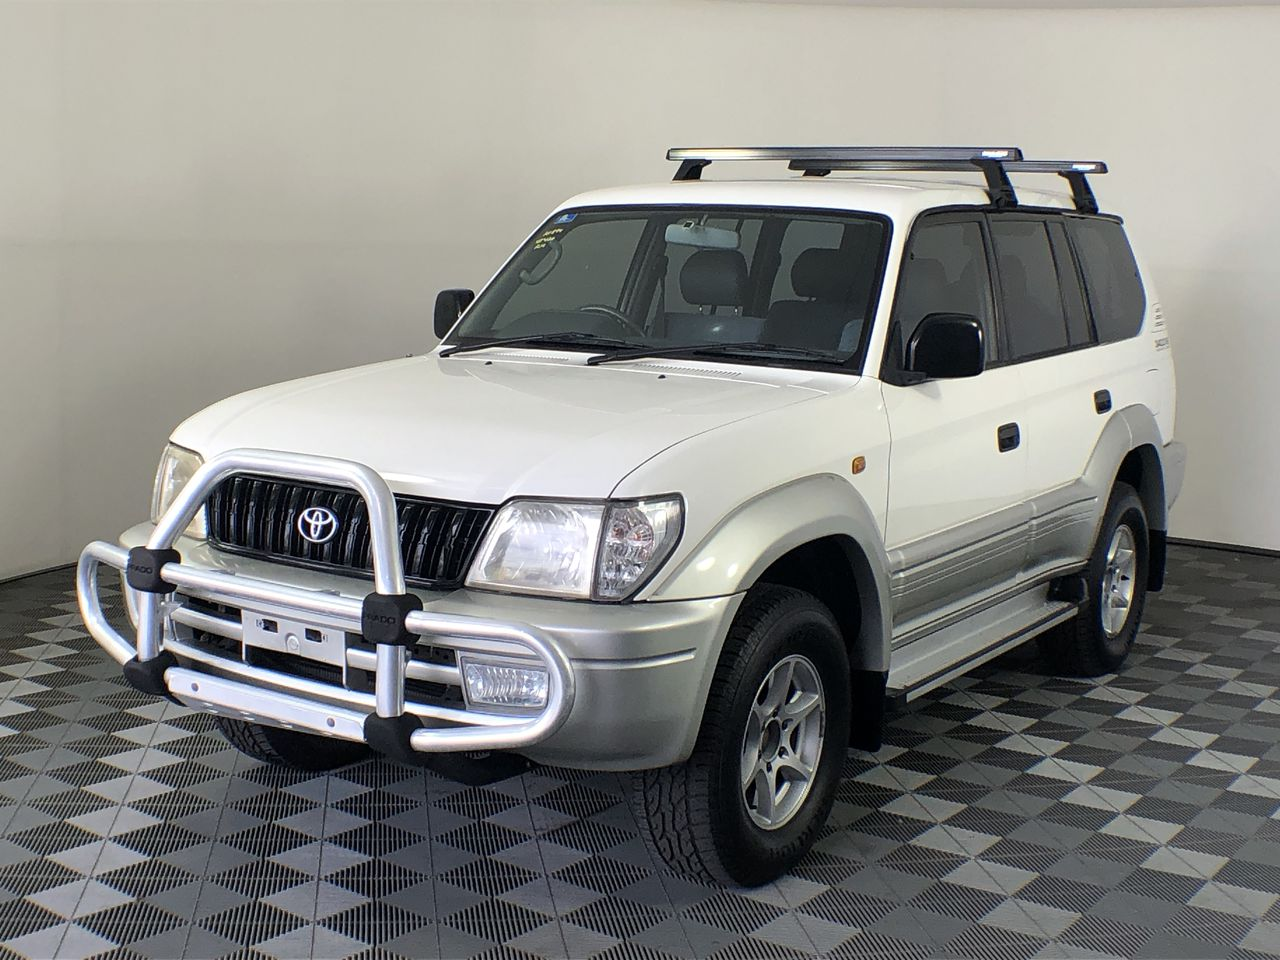 2002 Toyota Landcruiser Prado GXL (4x4) VZJ95R Automatic 8 Seats Wagon